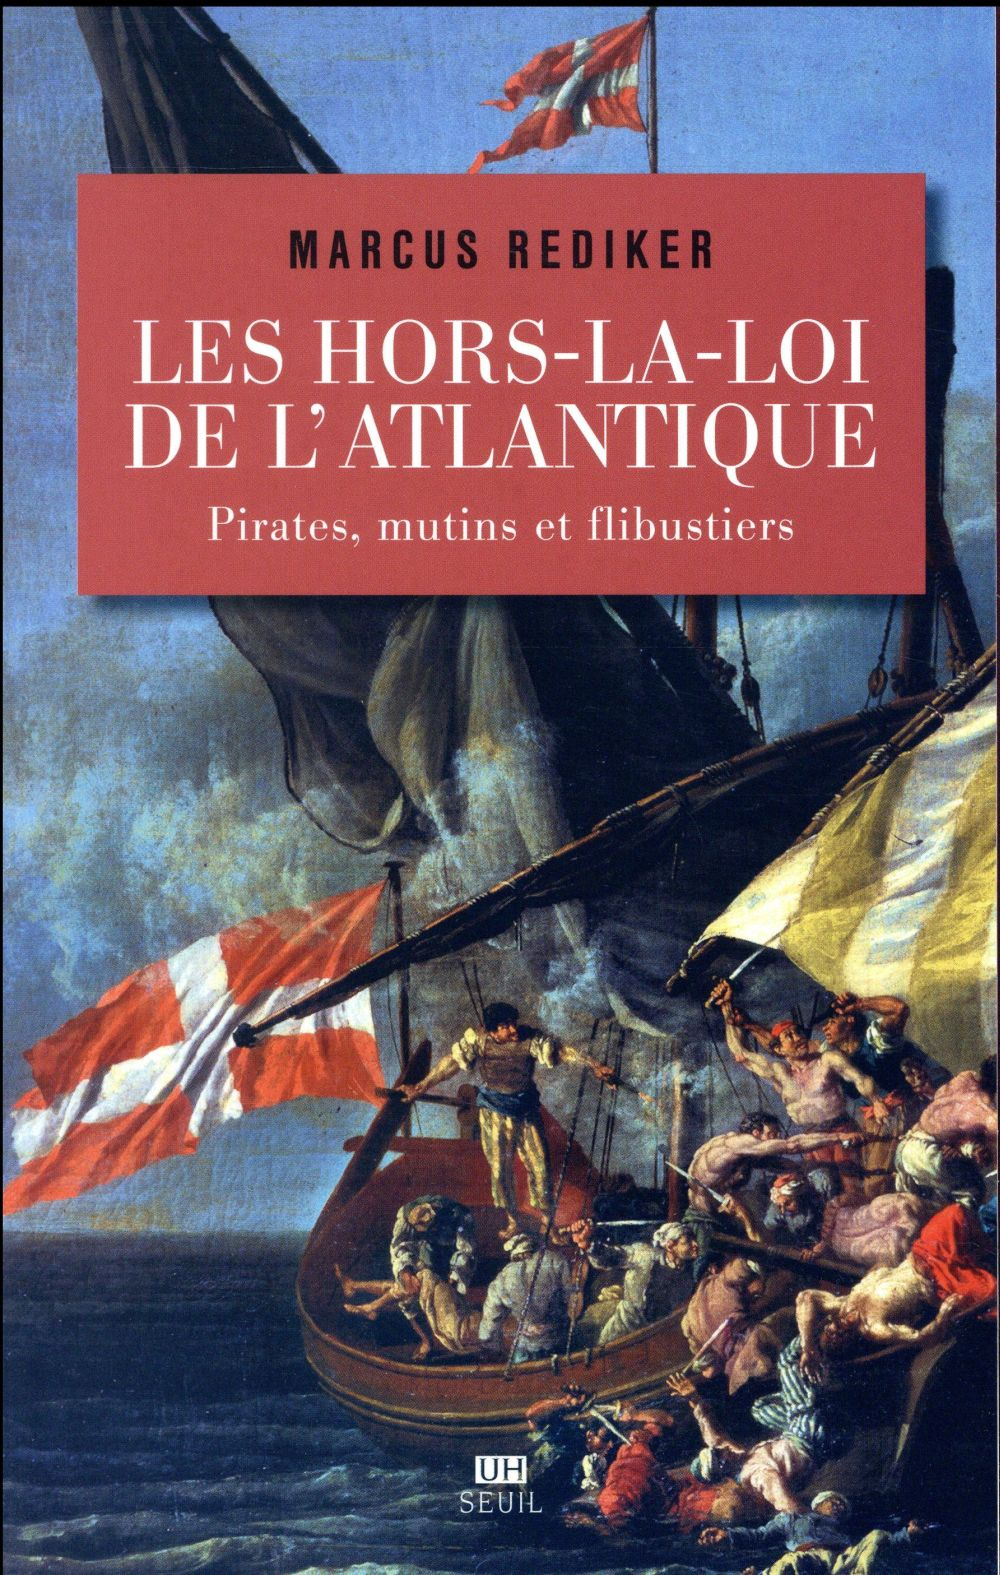 Les hors-la-loi de l'Atlantique ; pirates, mutins et flibustiers